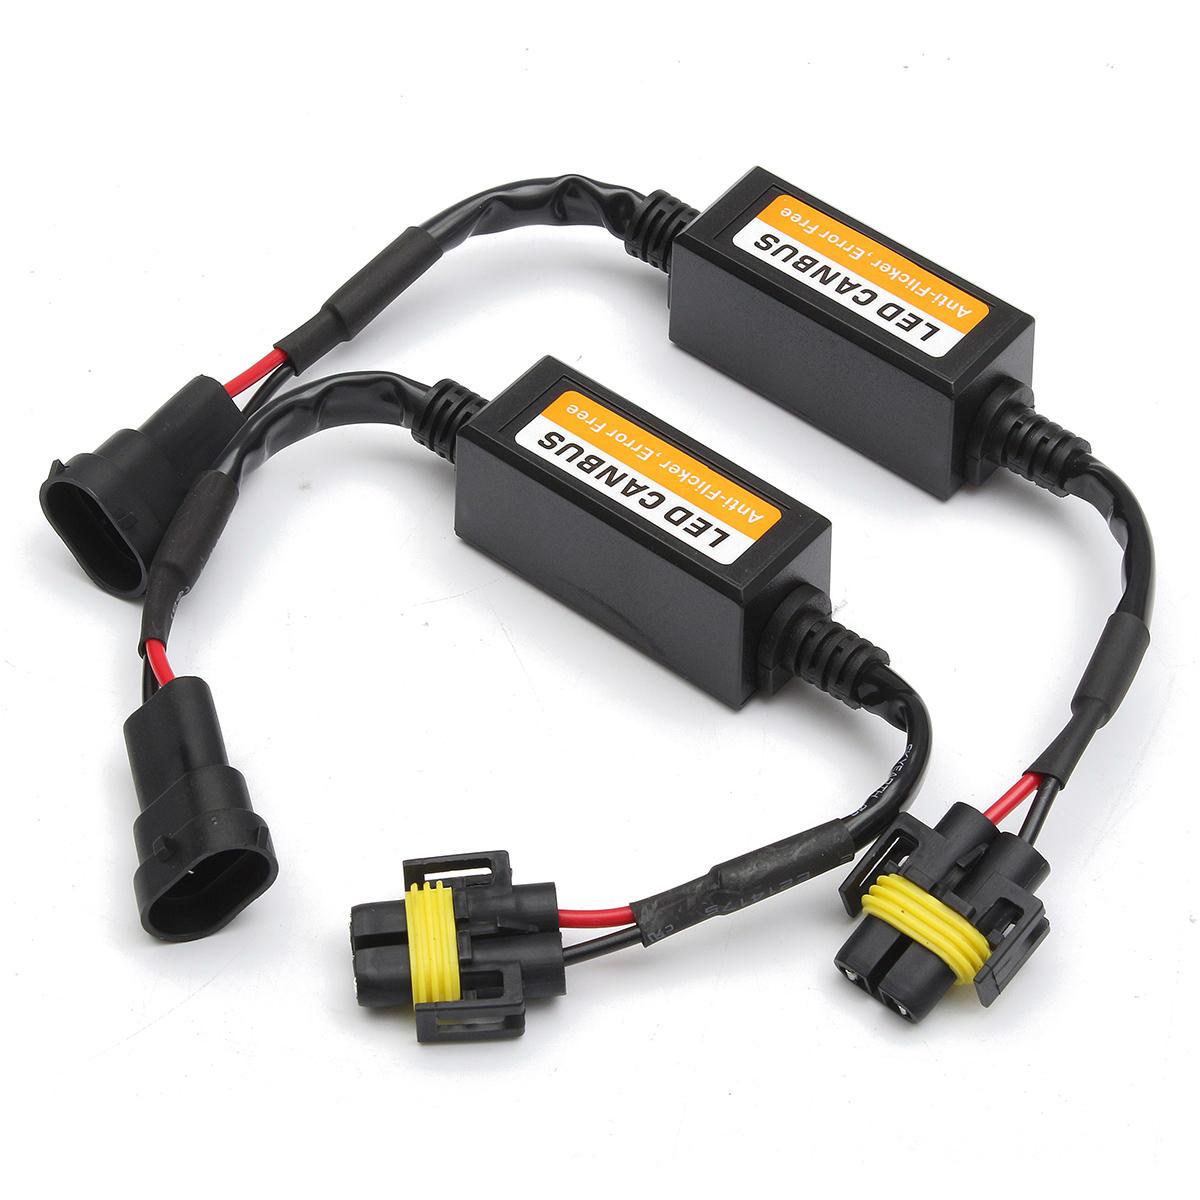 2x H7 Led Headlight Canbus Error Free Anti Flicker Resistor Canceller Decode ZW